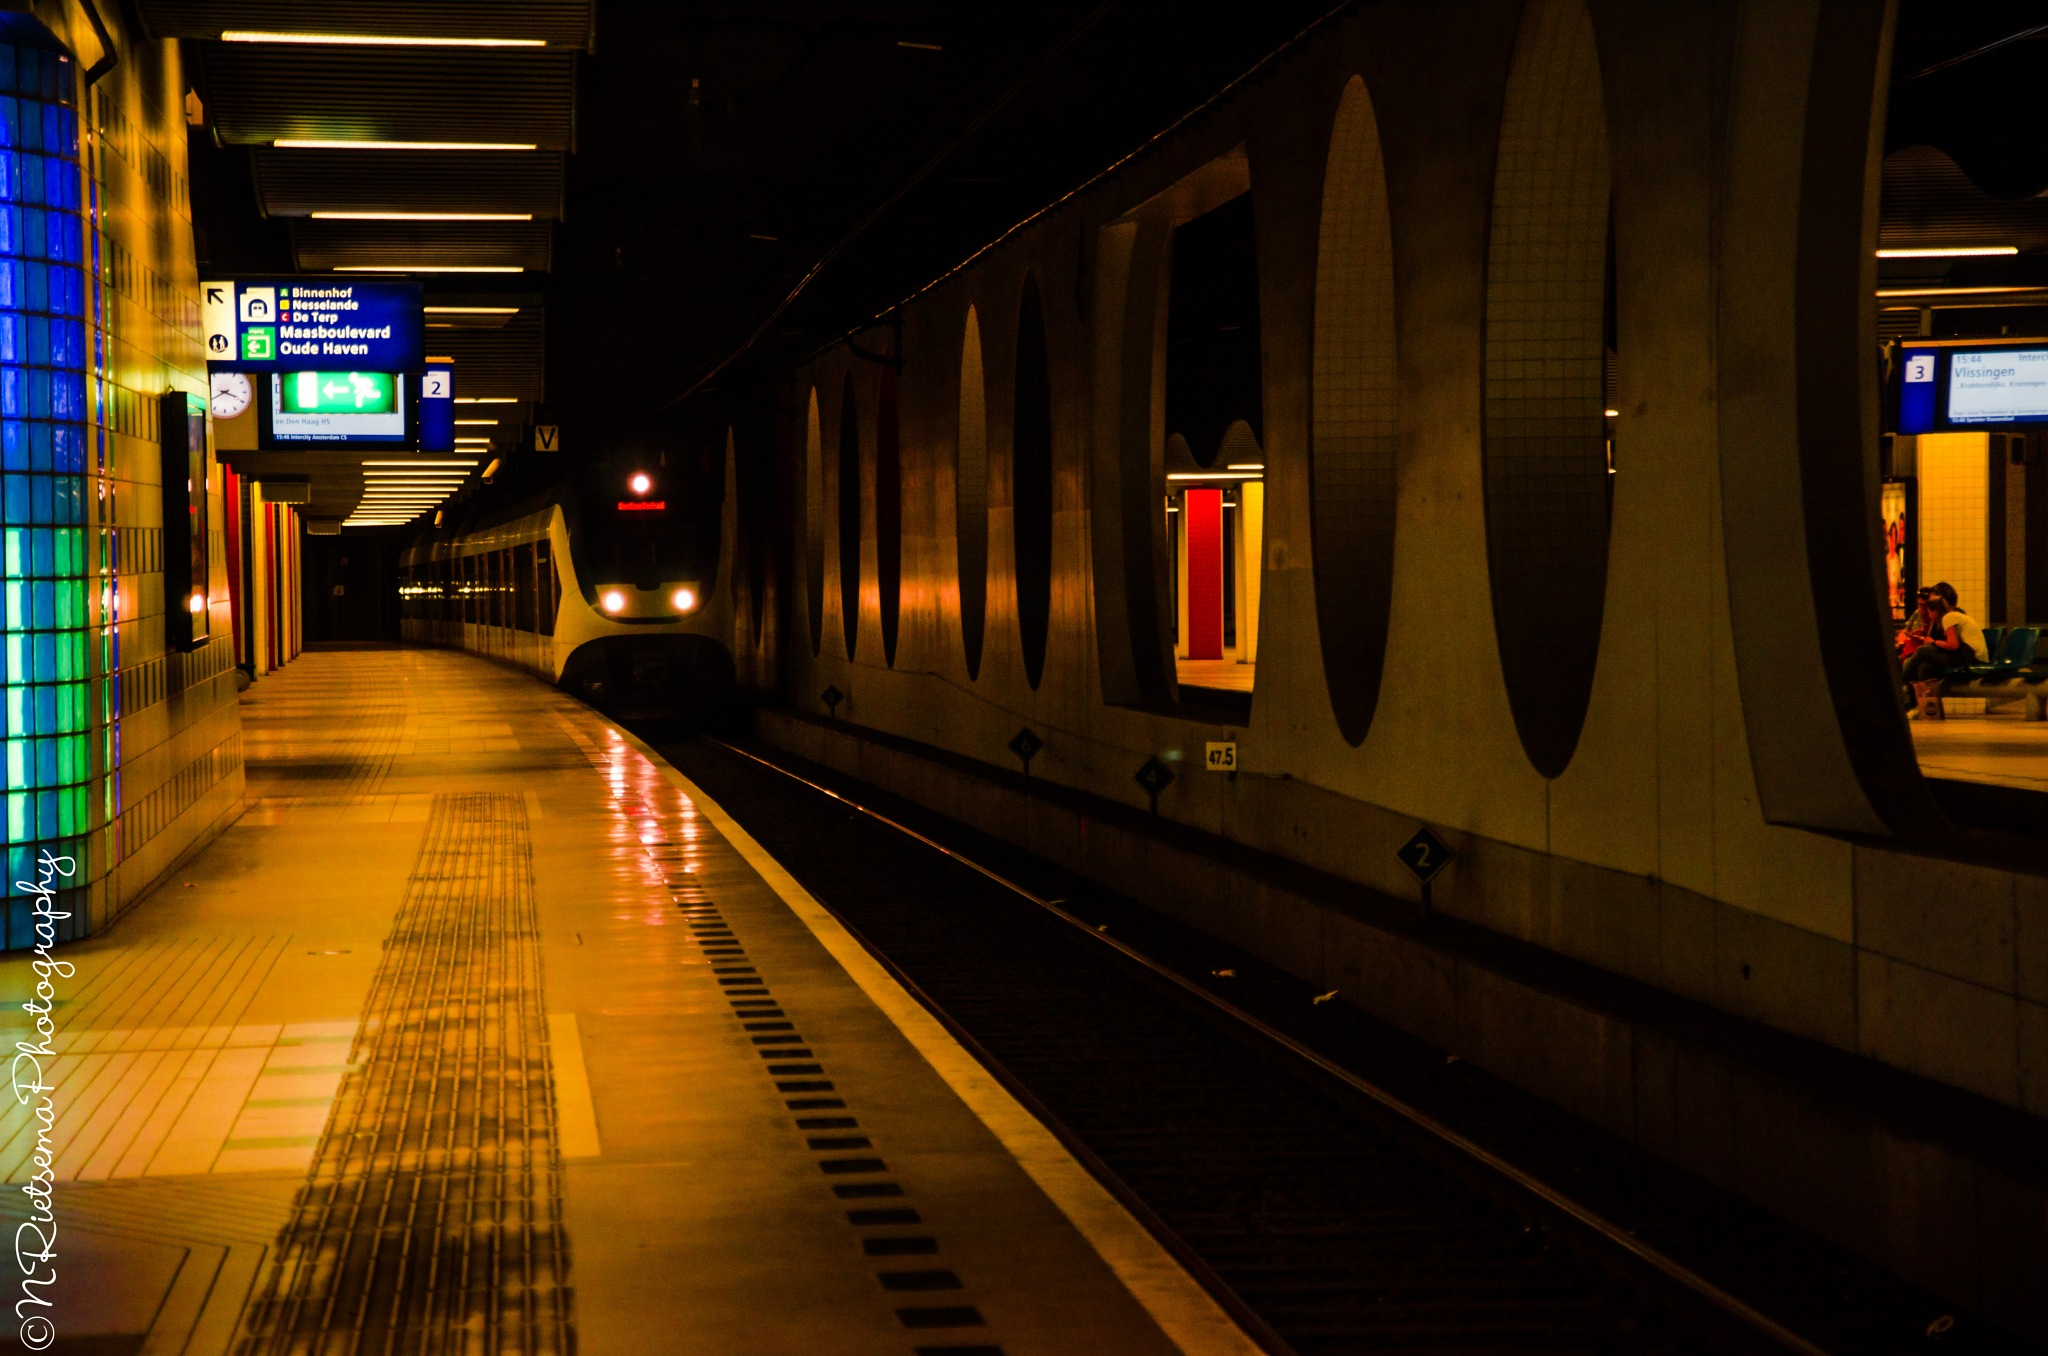 Ondergronds station... by NiaR